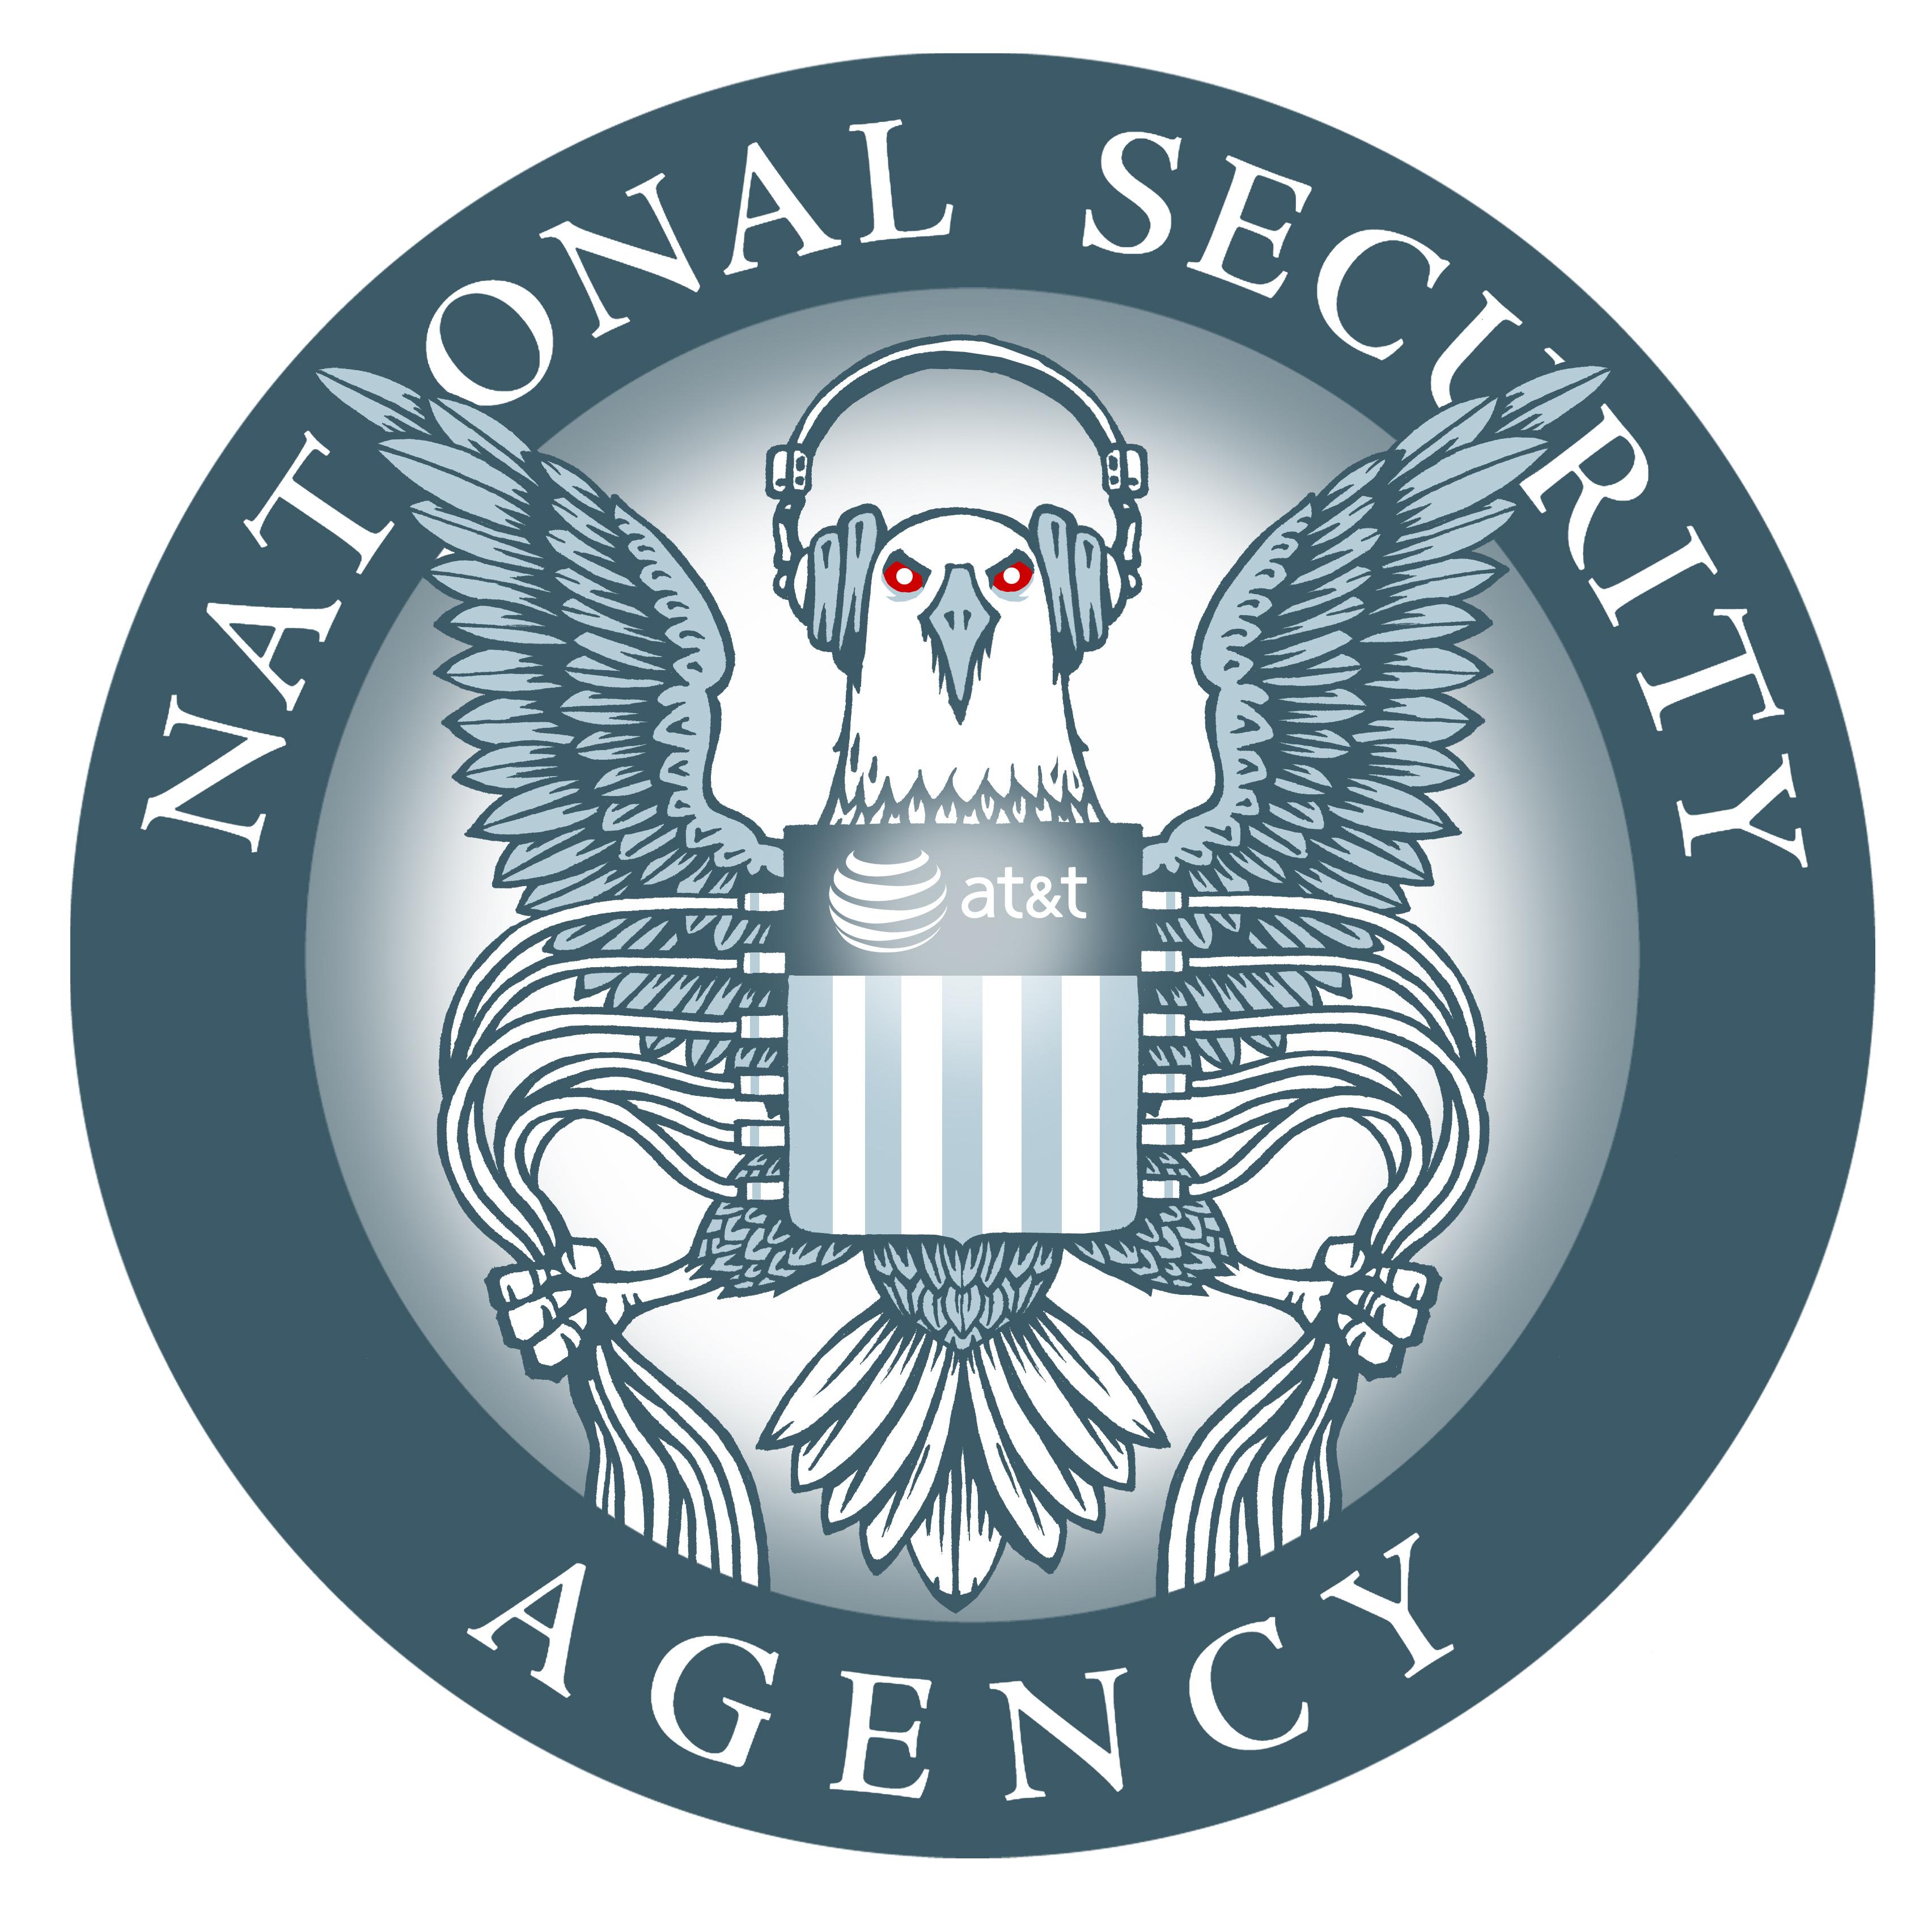 https://www.eff.org/files/nsa-eagle.jpg